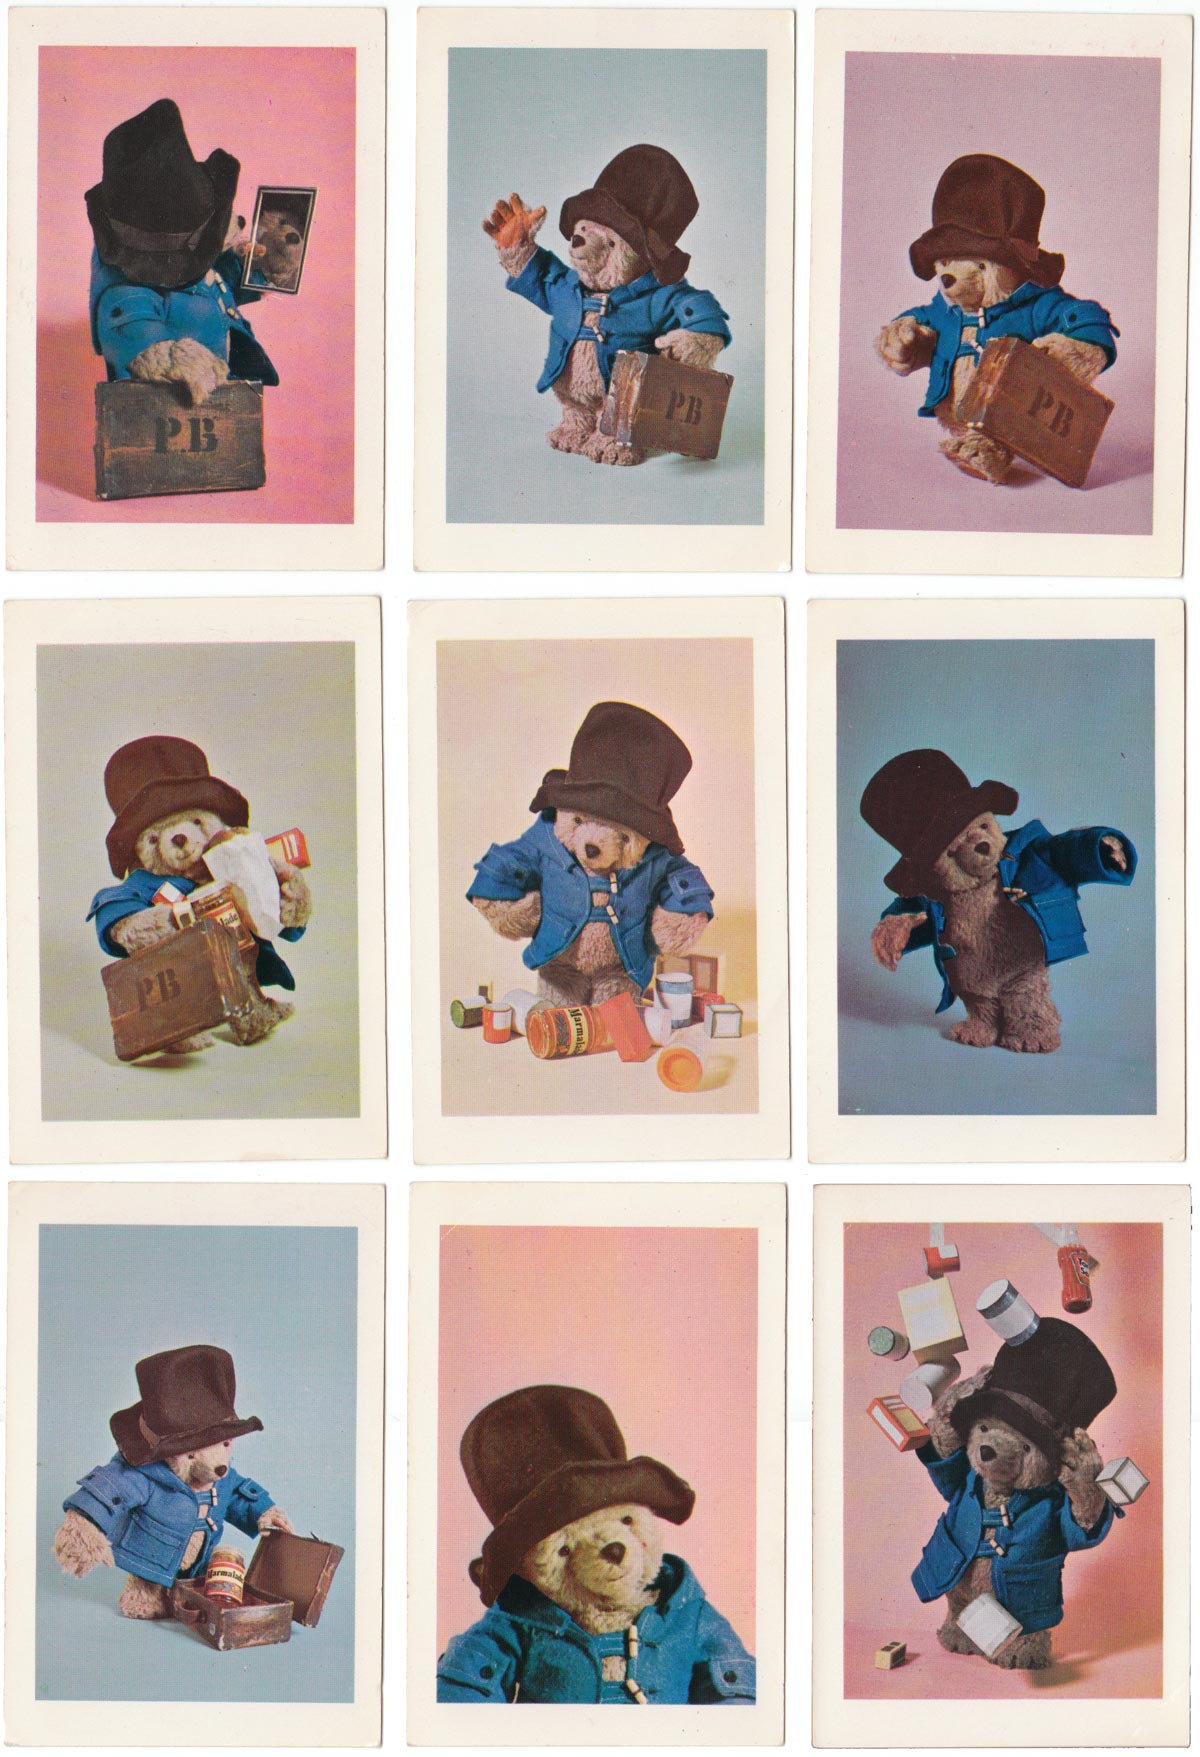 Paddington card game published in UK by Whitman (USA)